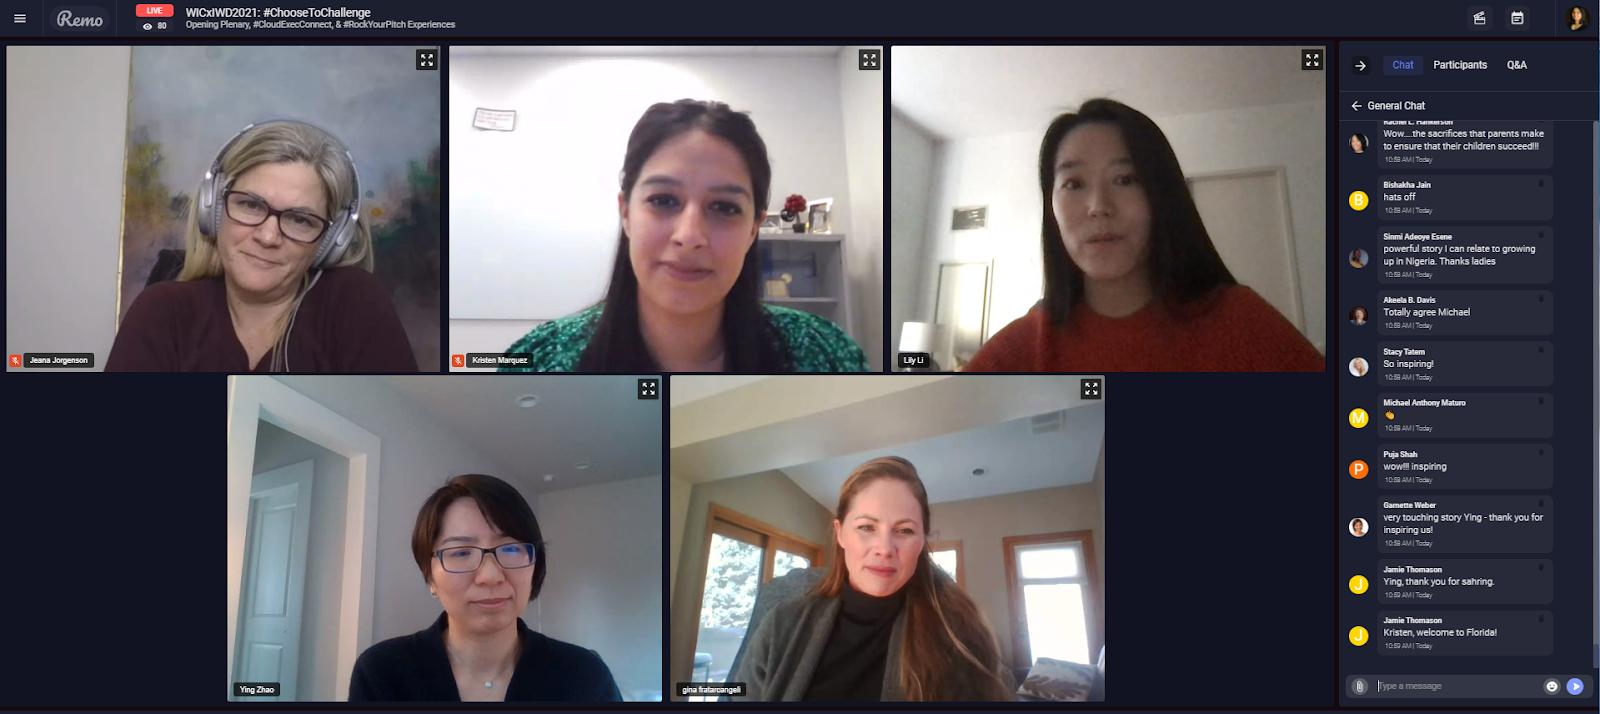 #ChoosetoChallenge Power Panel at Women In Cloud IWD2021 Event